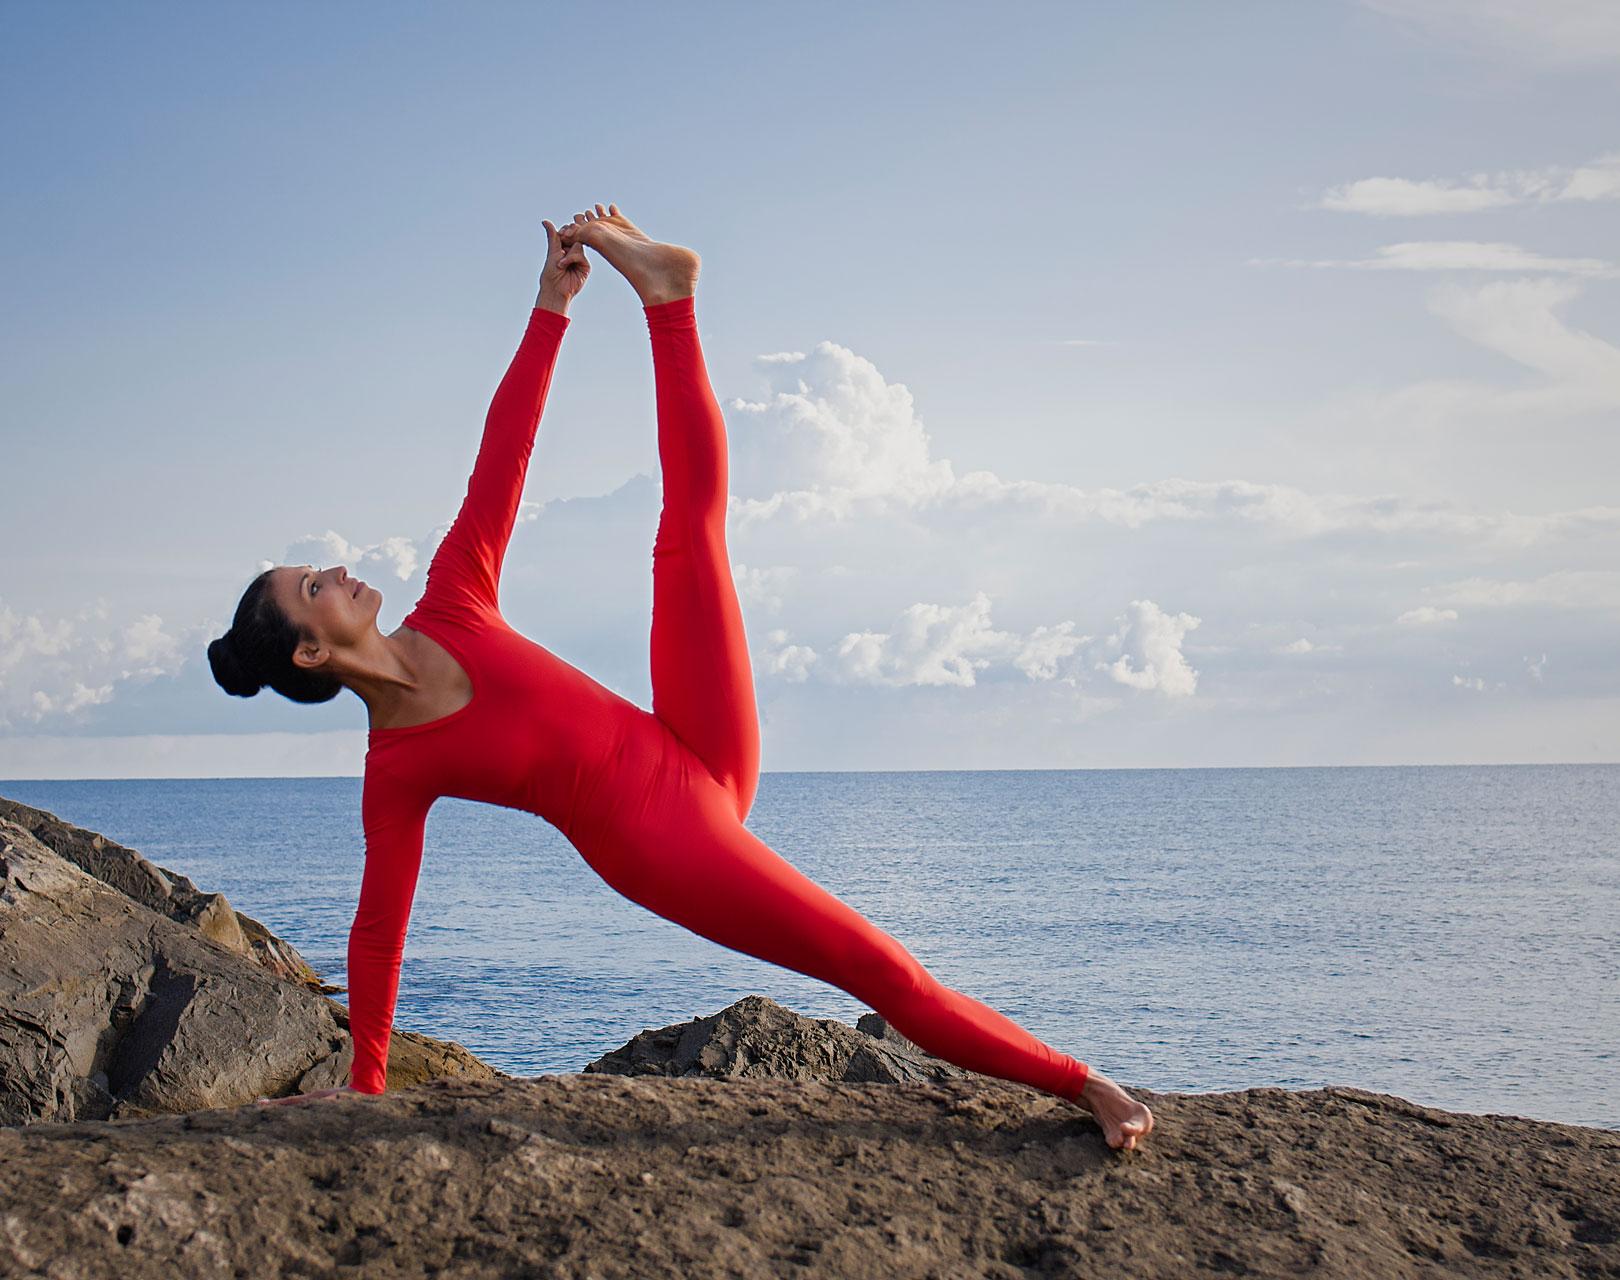 Айенгар йога клас за Ратха Ятра фестивал